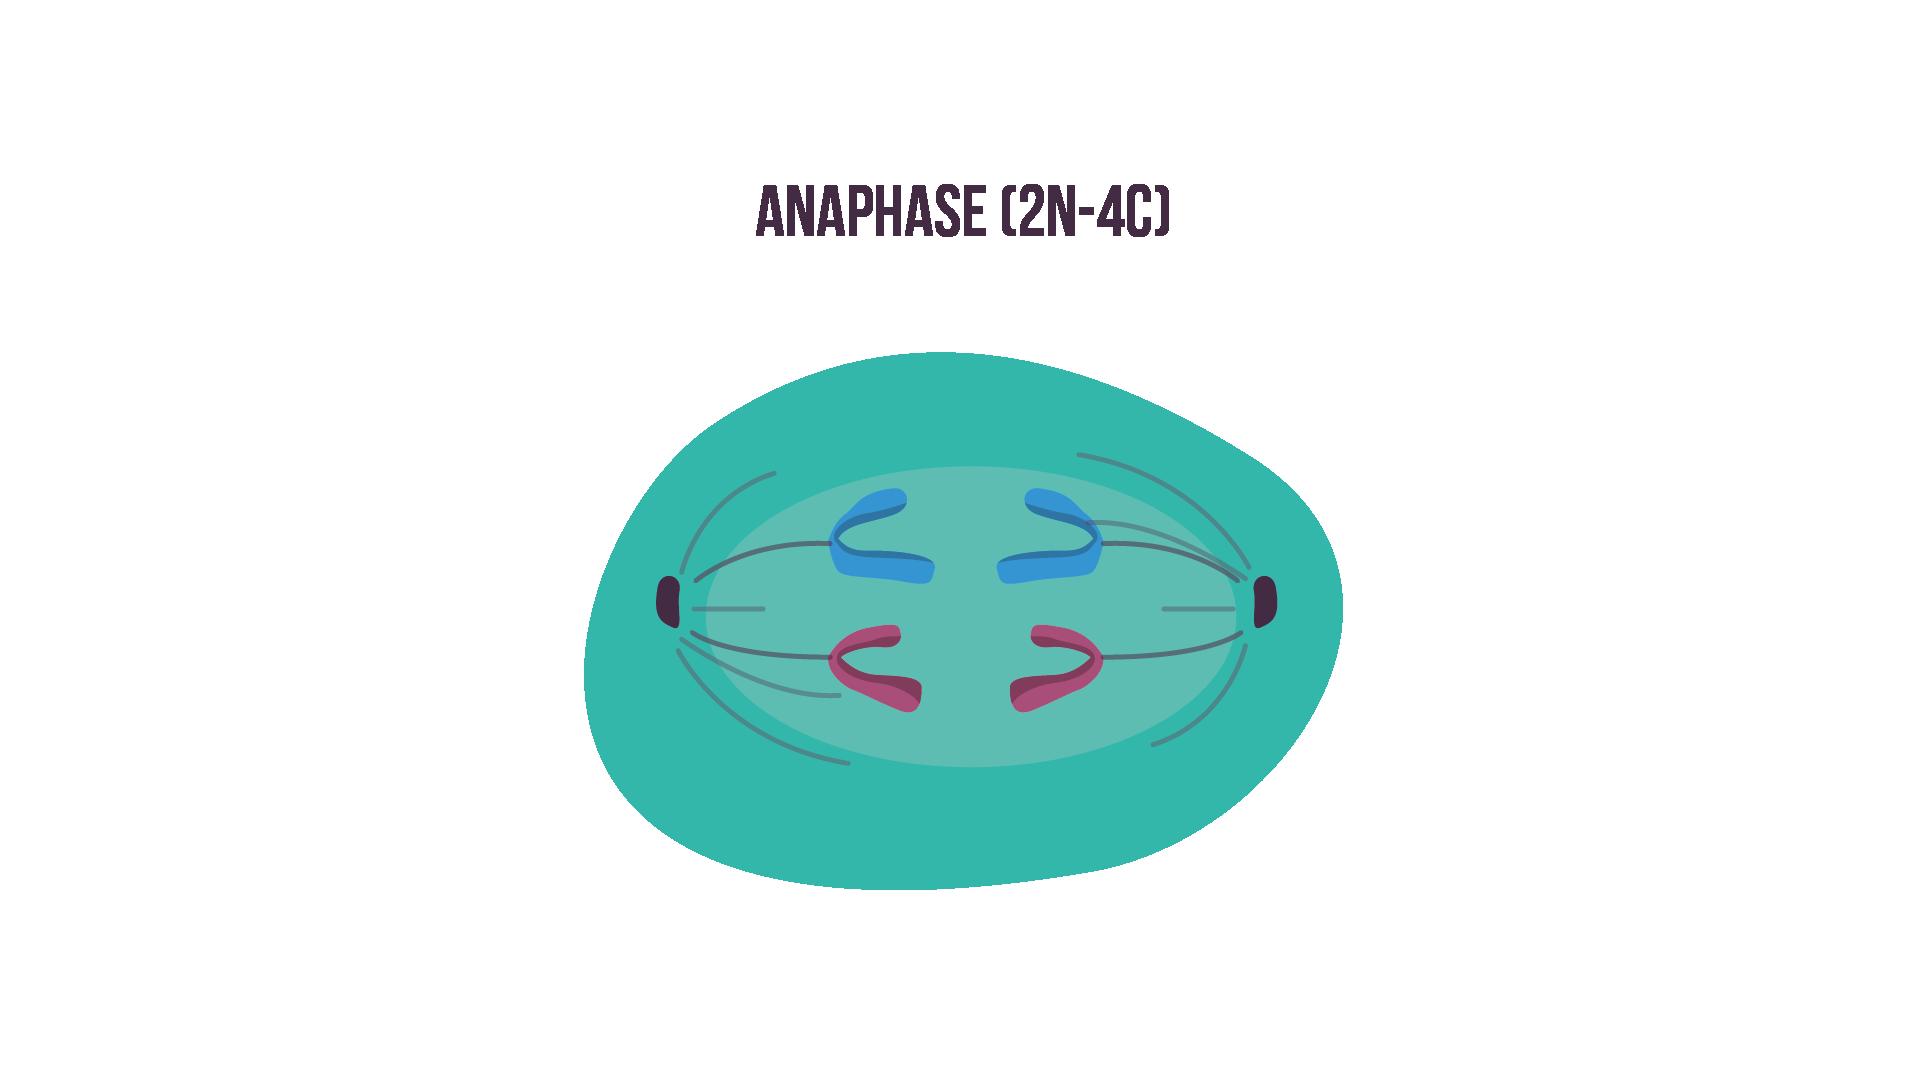 L'anaphase